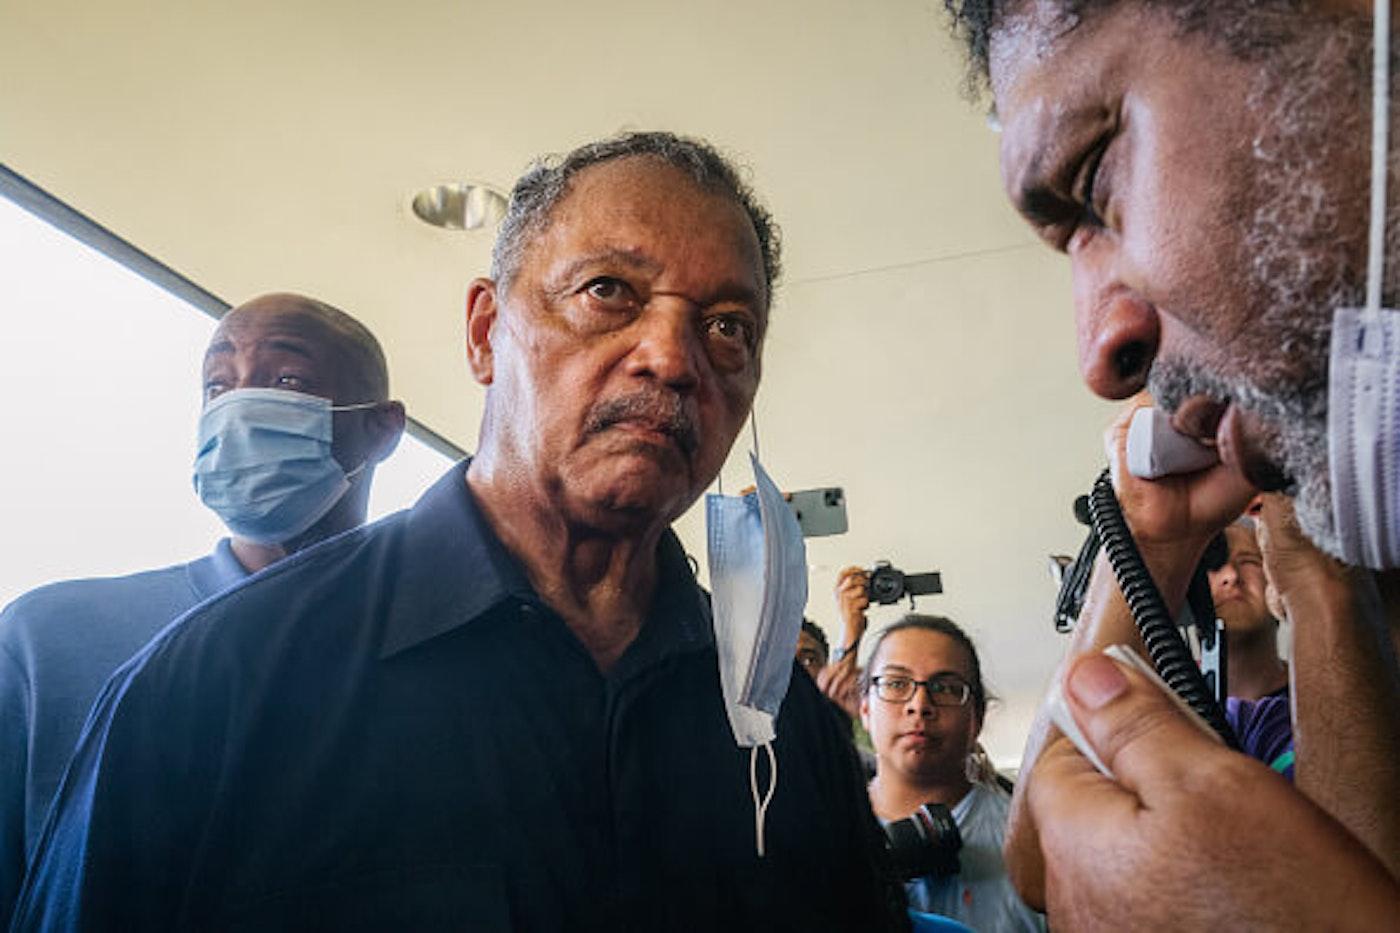 Rev. Jesse Jackson (C), listens during a sit-in demonstration outside the office of Sen. Kyrsten Sinema (D-AZ) on July 26, 2021 in Phoenix, Arizona.